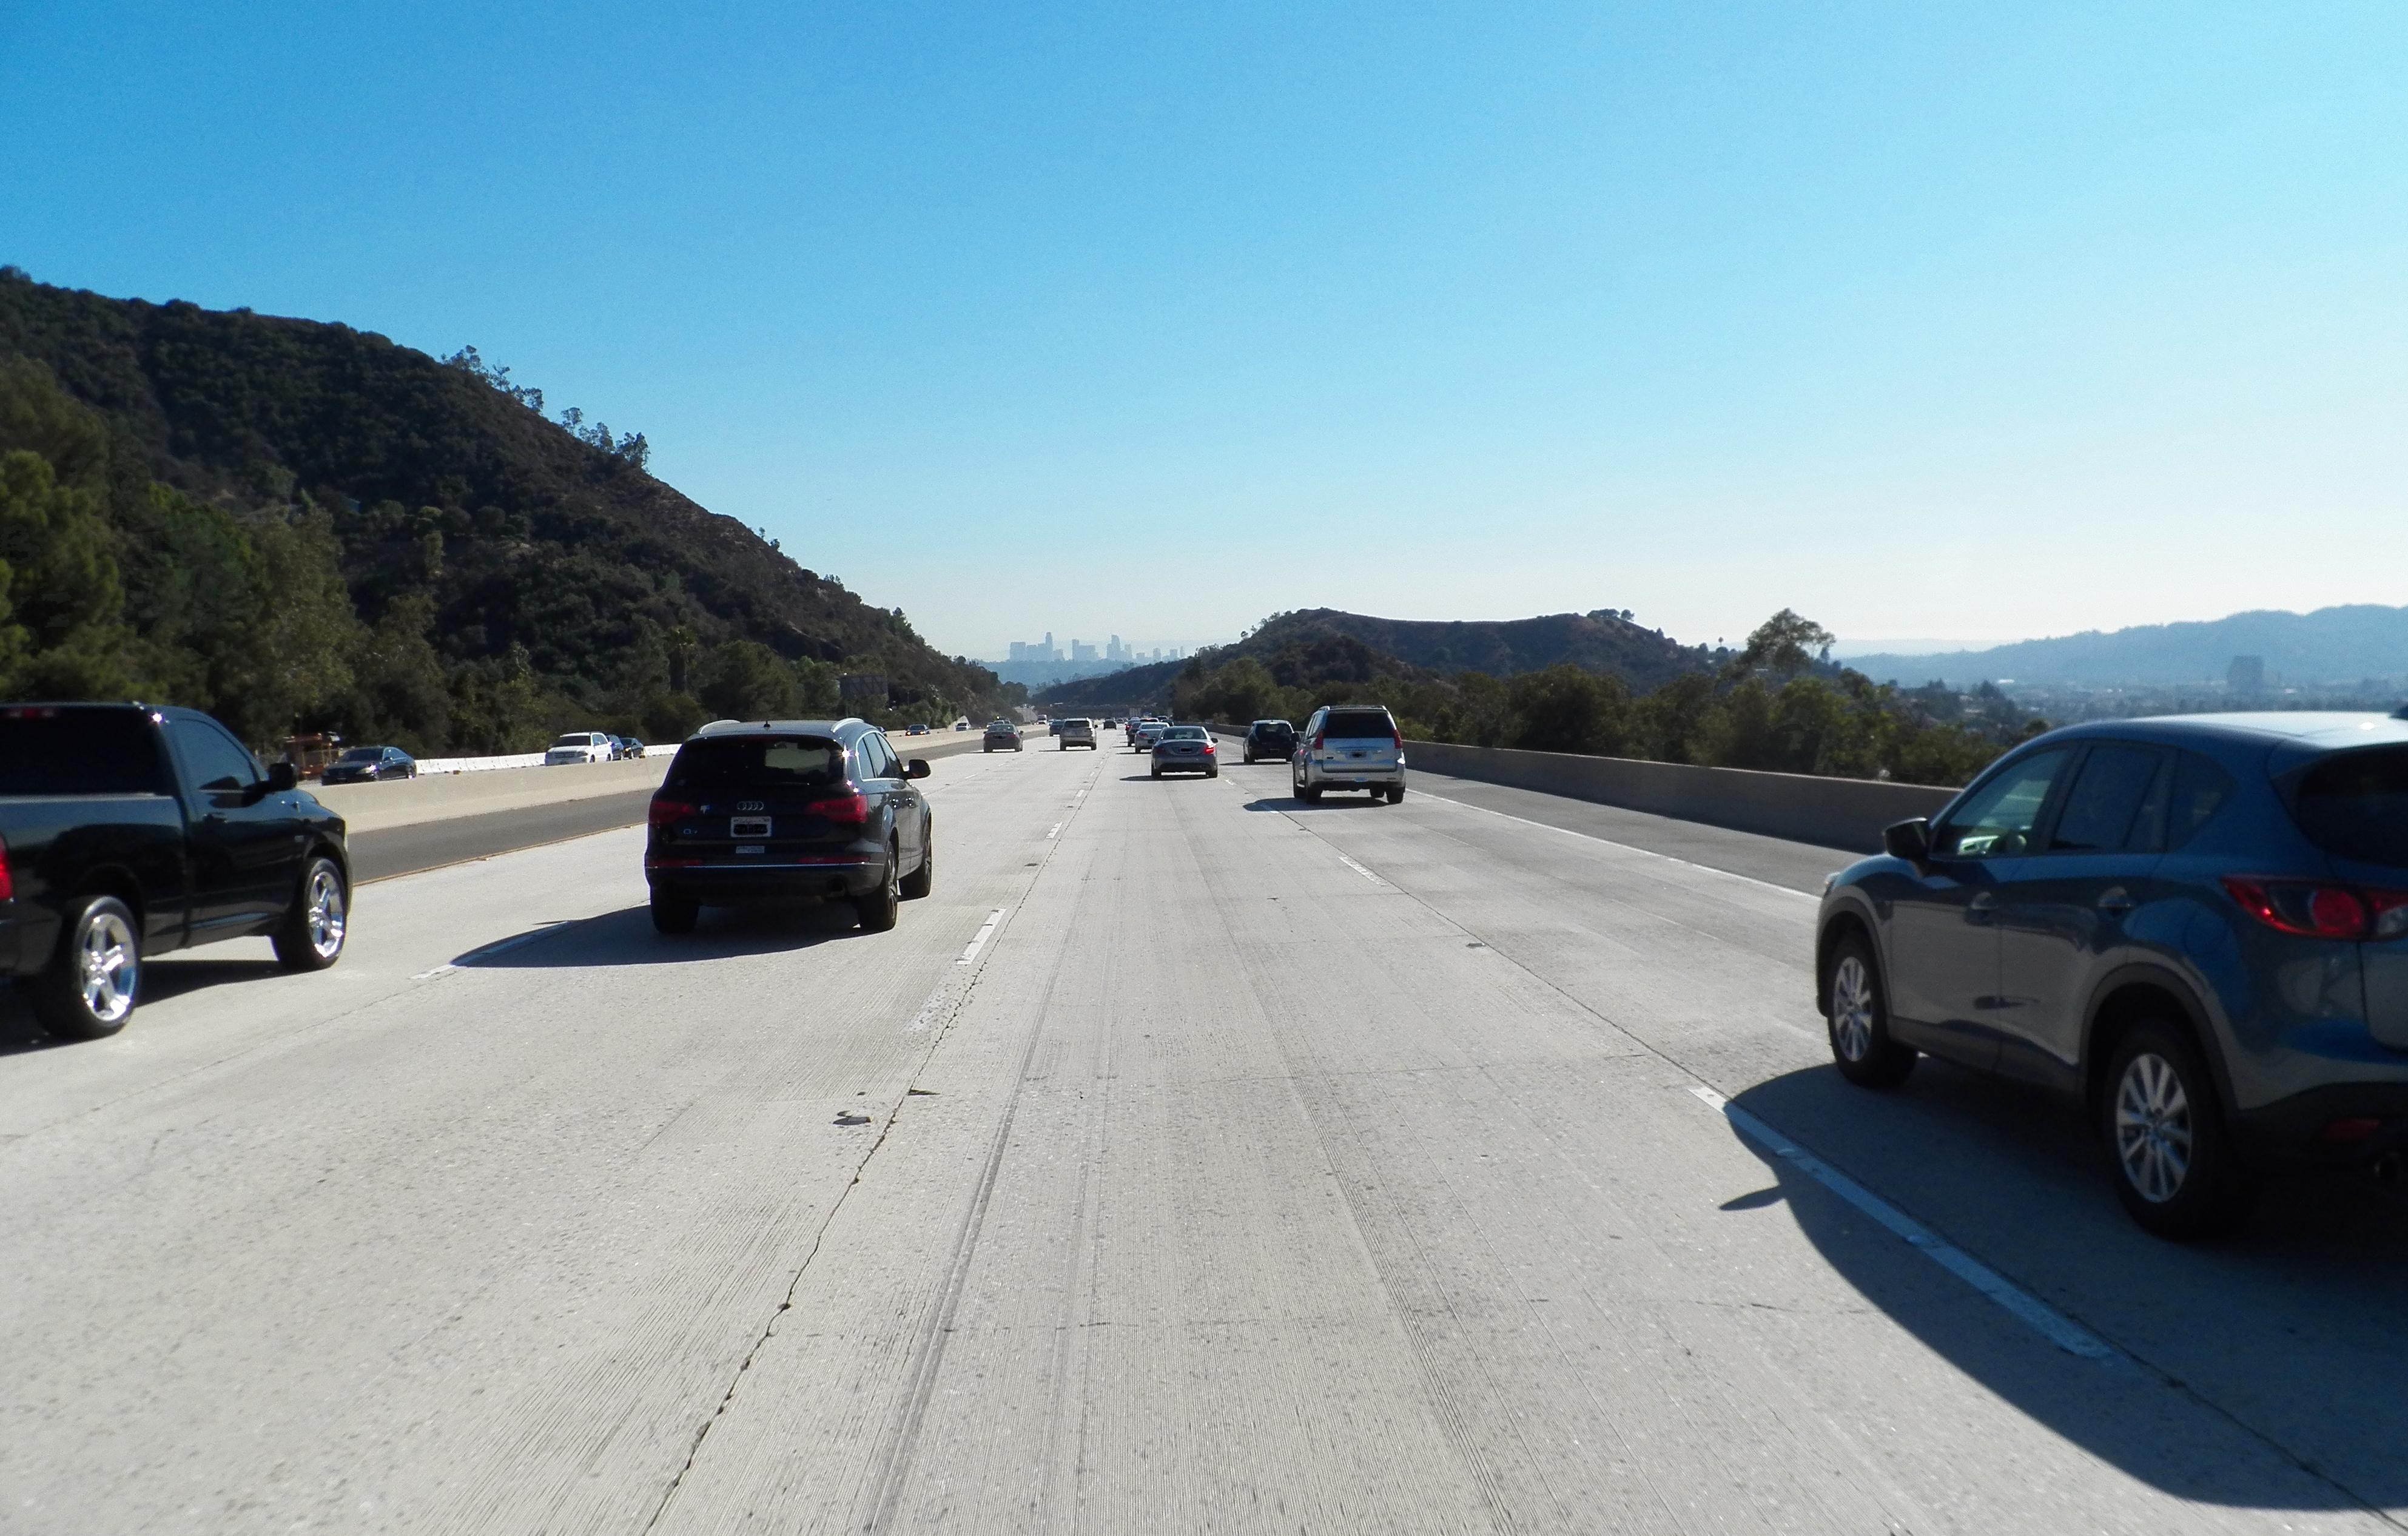 Over the hill to LA, California, Car, Freeway, Horizon, HQ Photo